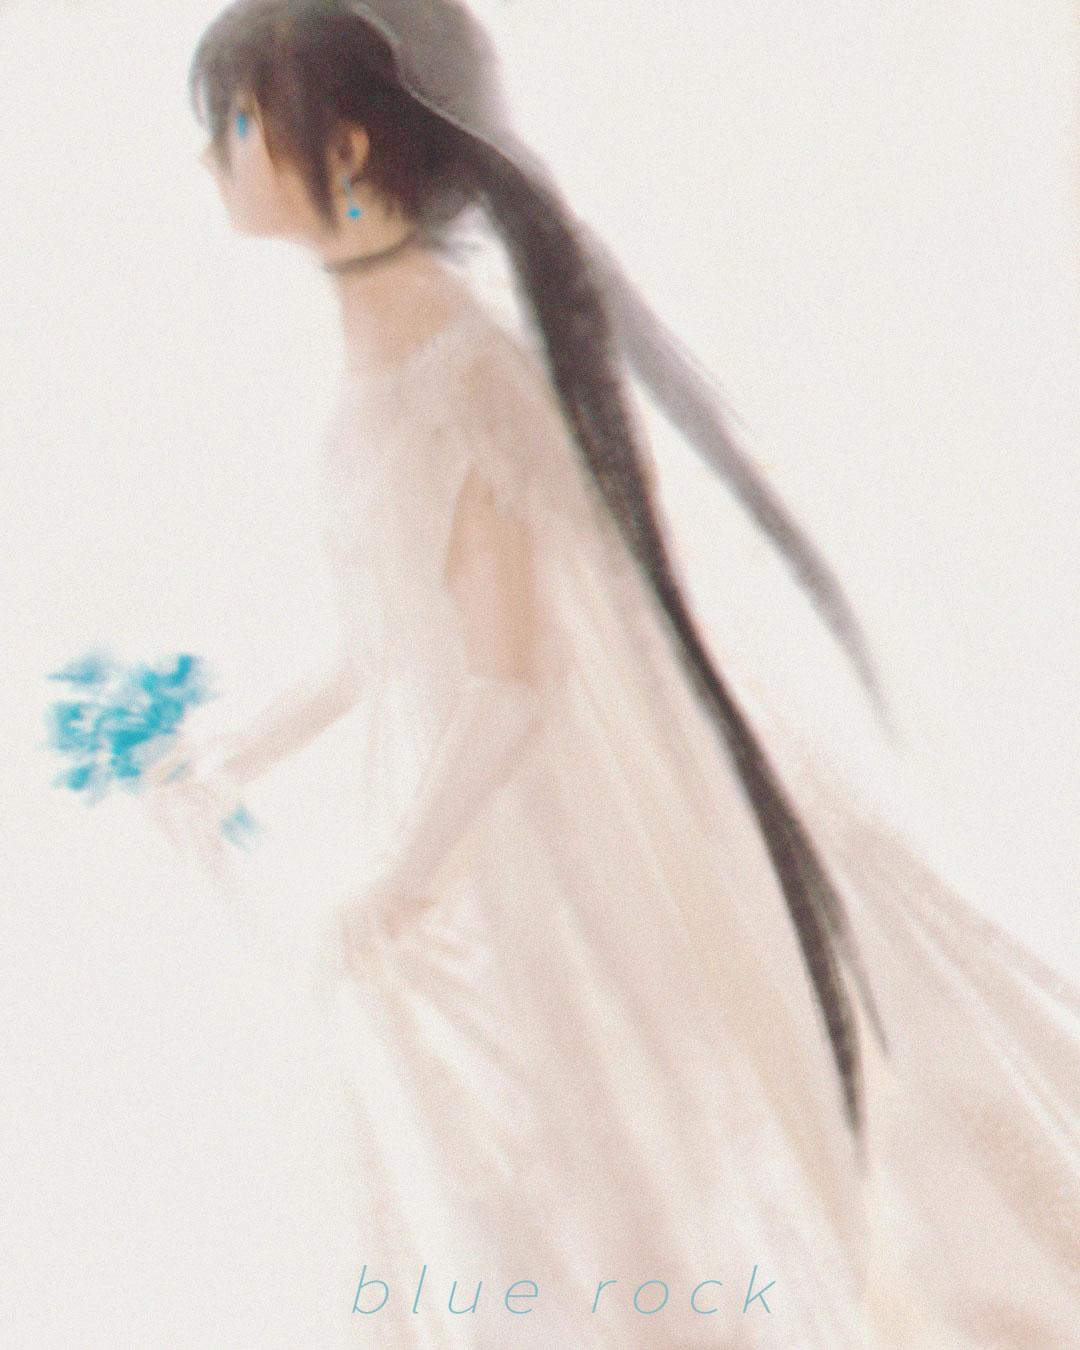 black_rock_shooter black_rock_shooter_(character) sukienka